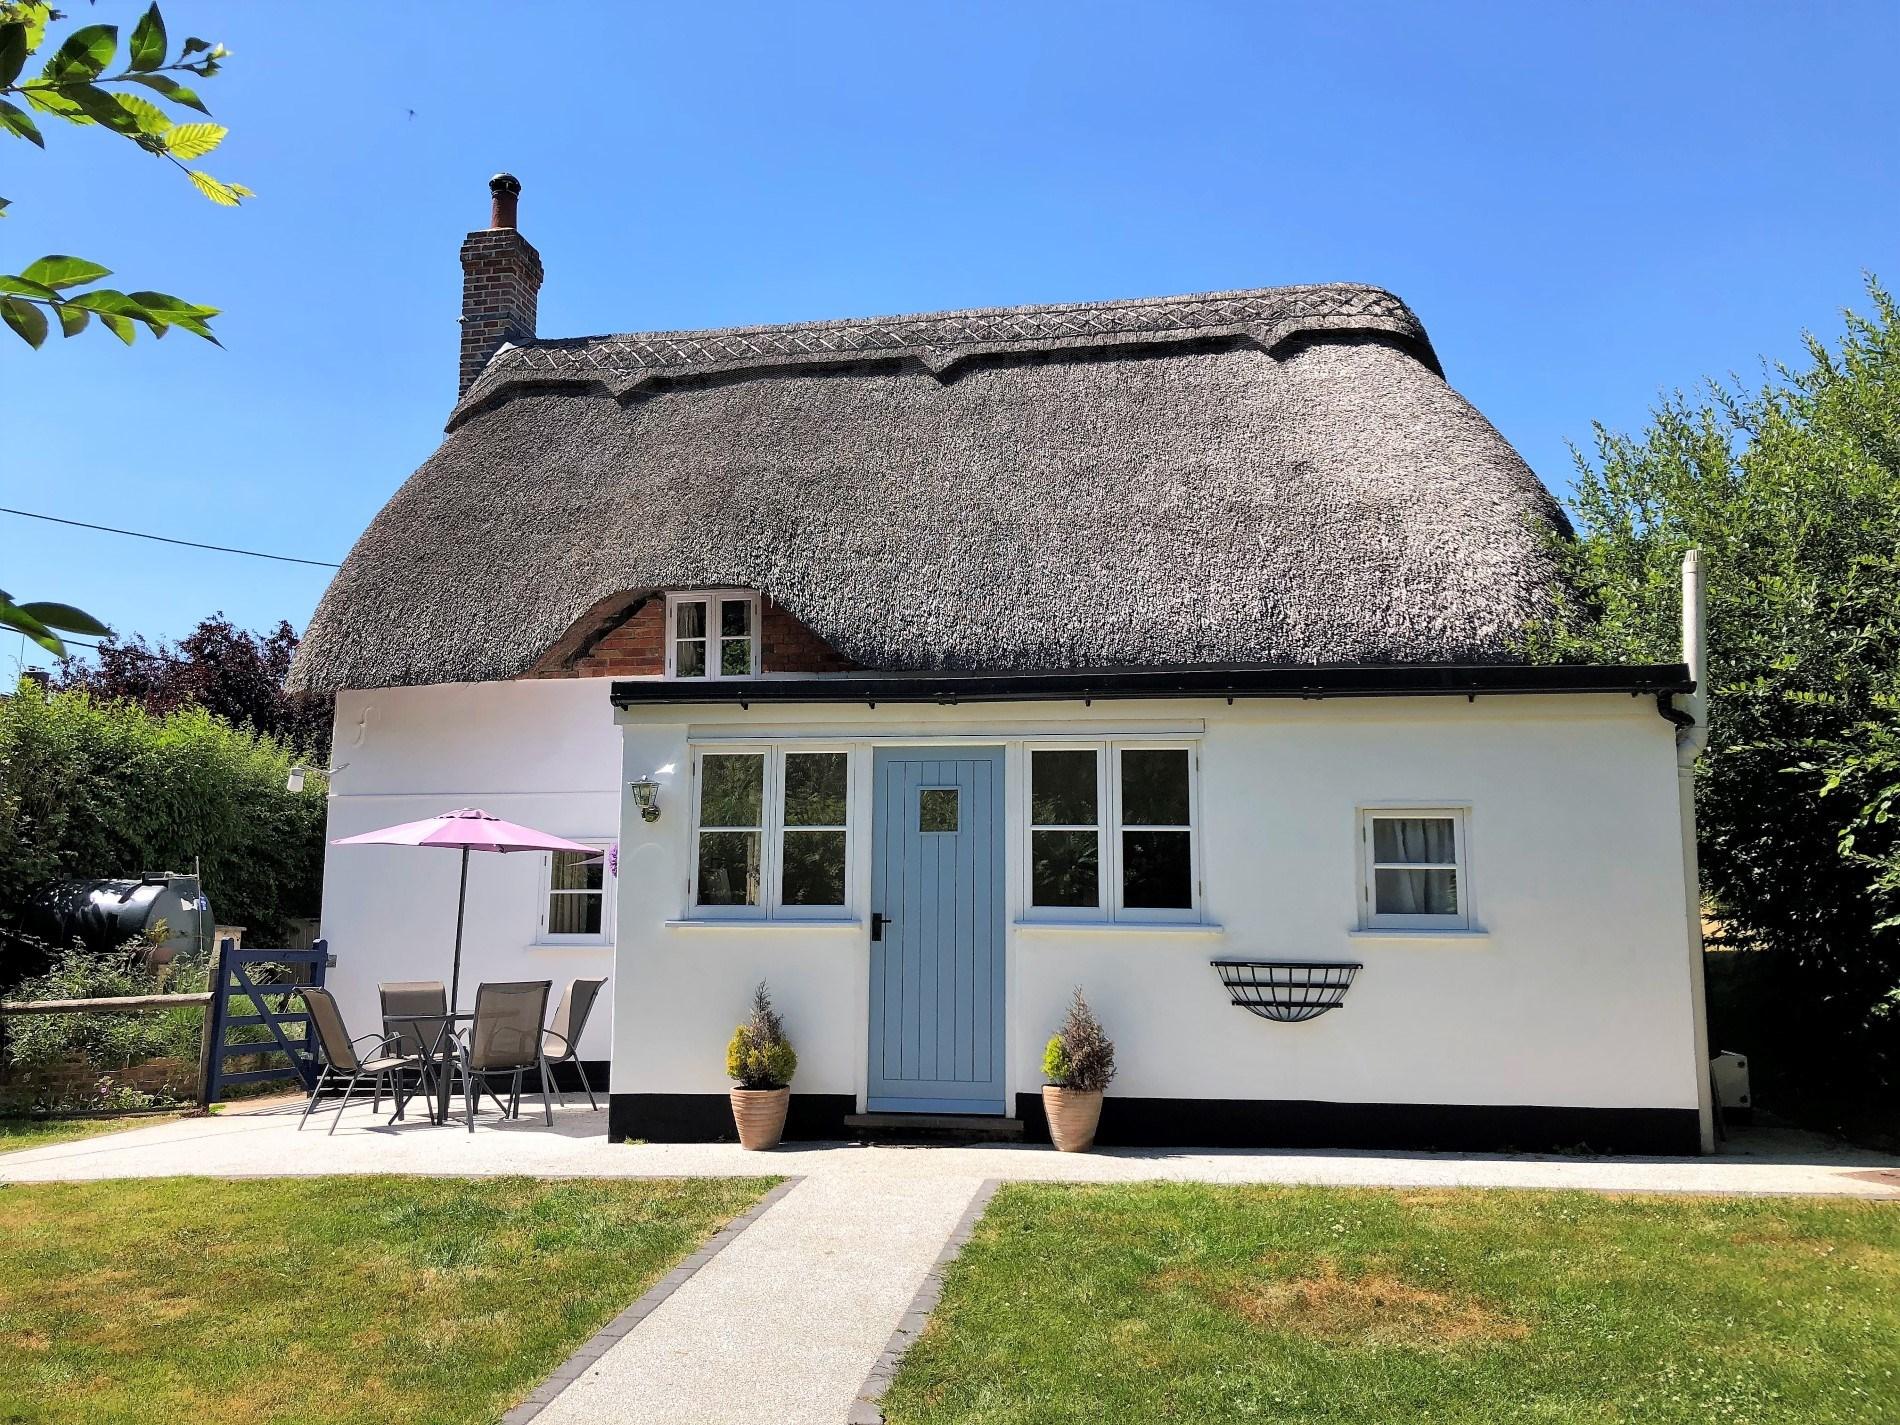 Ferienhaus in Godshill-Hampshire